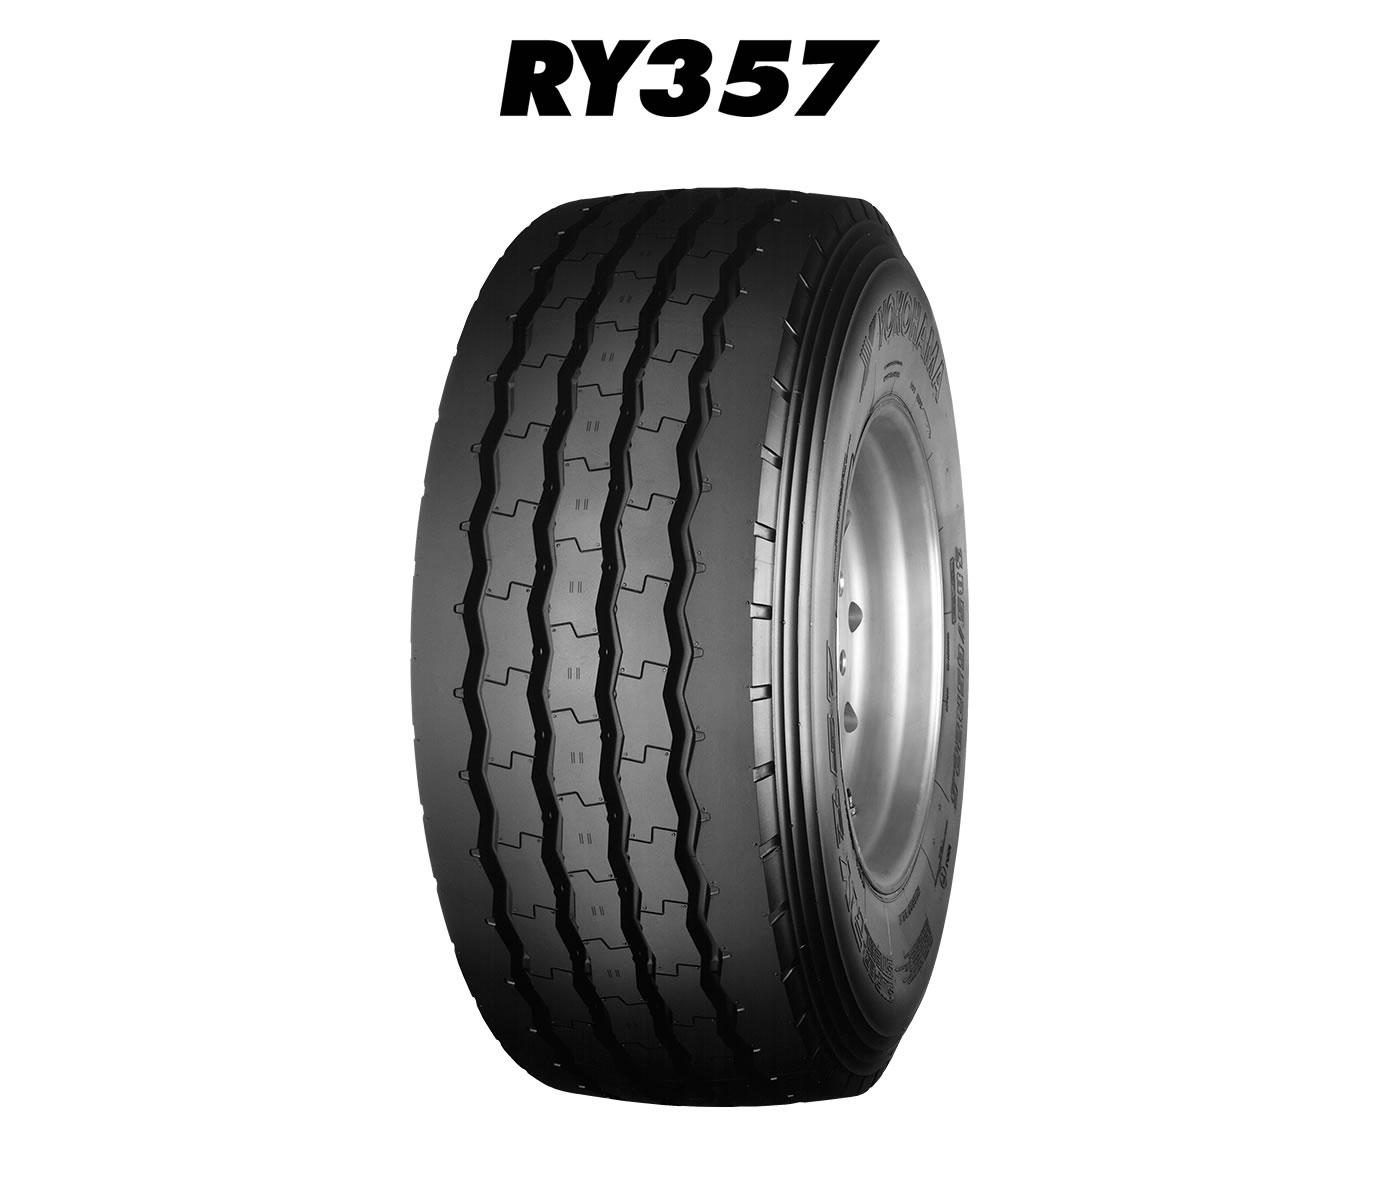 YOKOHAMA-38555-R-225-RY357-Tehergepkocsi-potkocsi-RY357-gumi